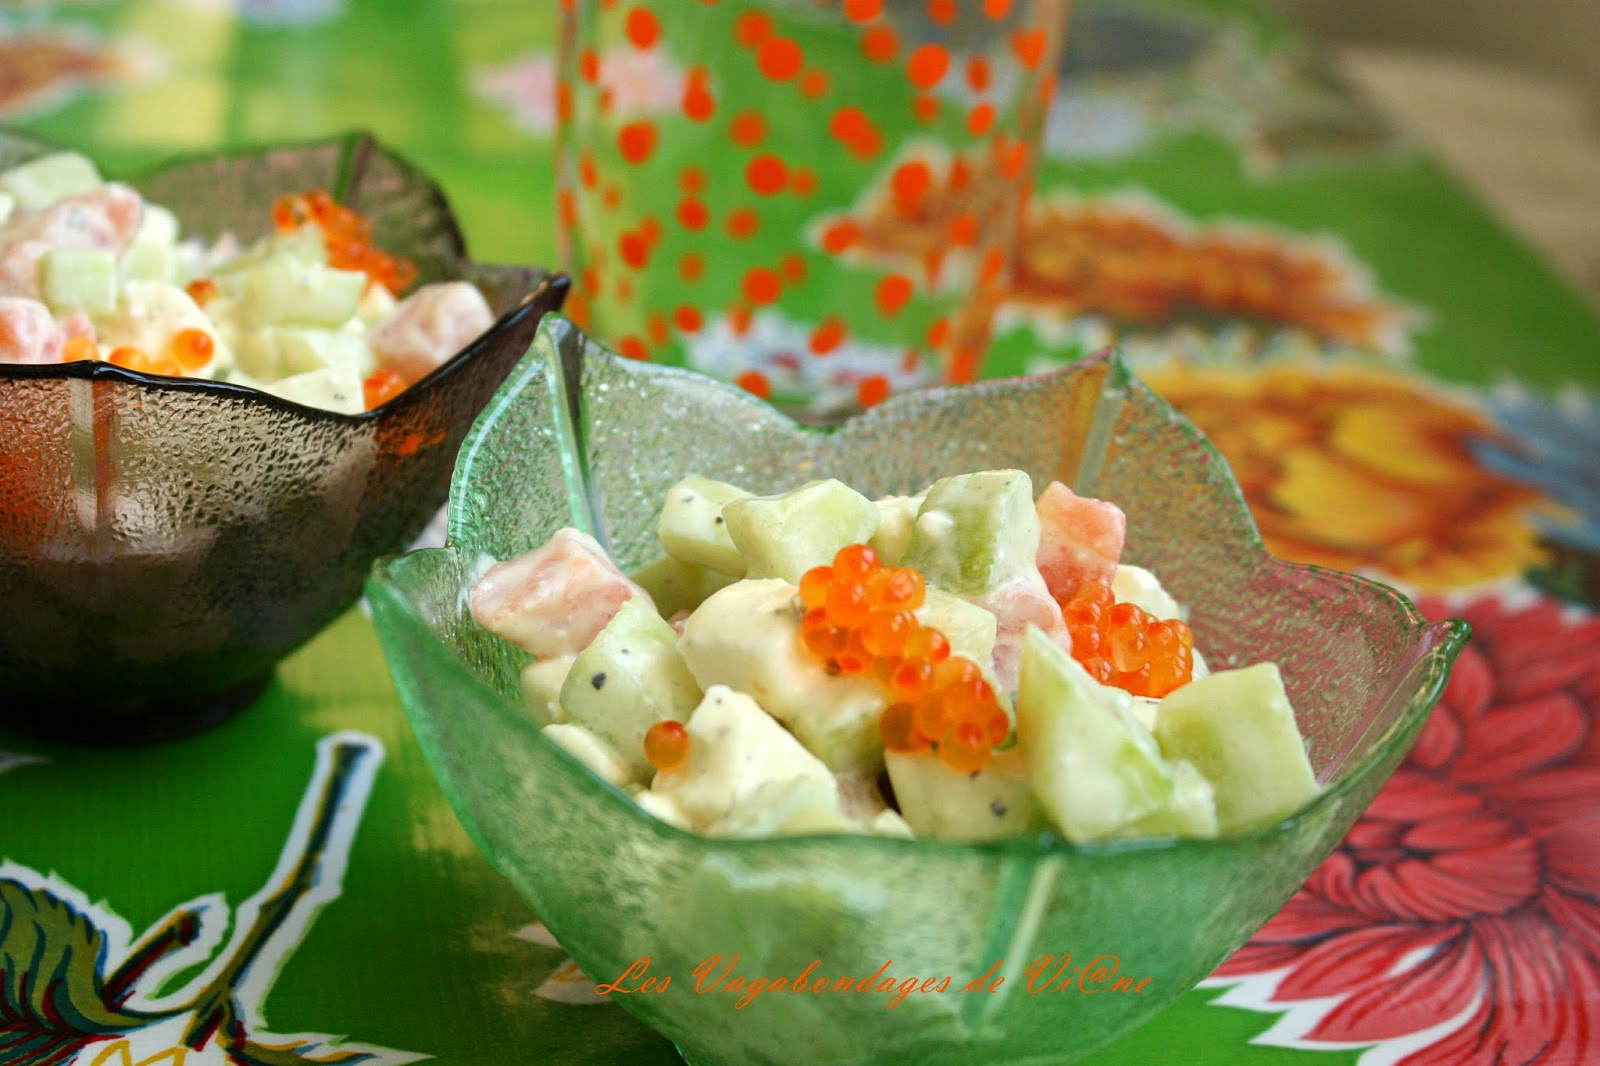 salade concombre saumon f ta blogs de cuisine. Black Bedroom Furniture Sets. Home Design Ideas